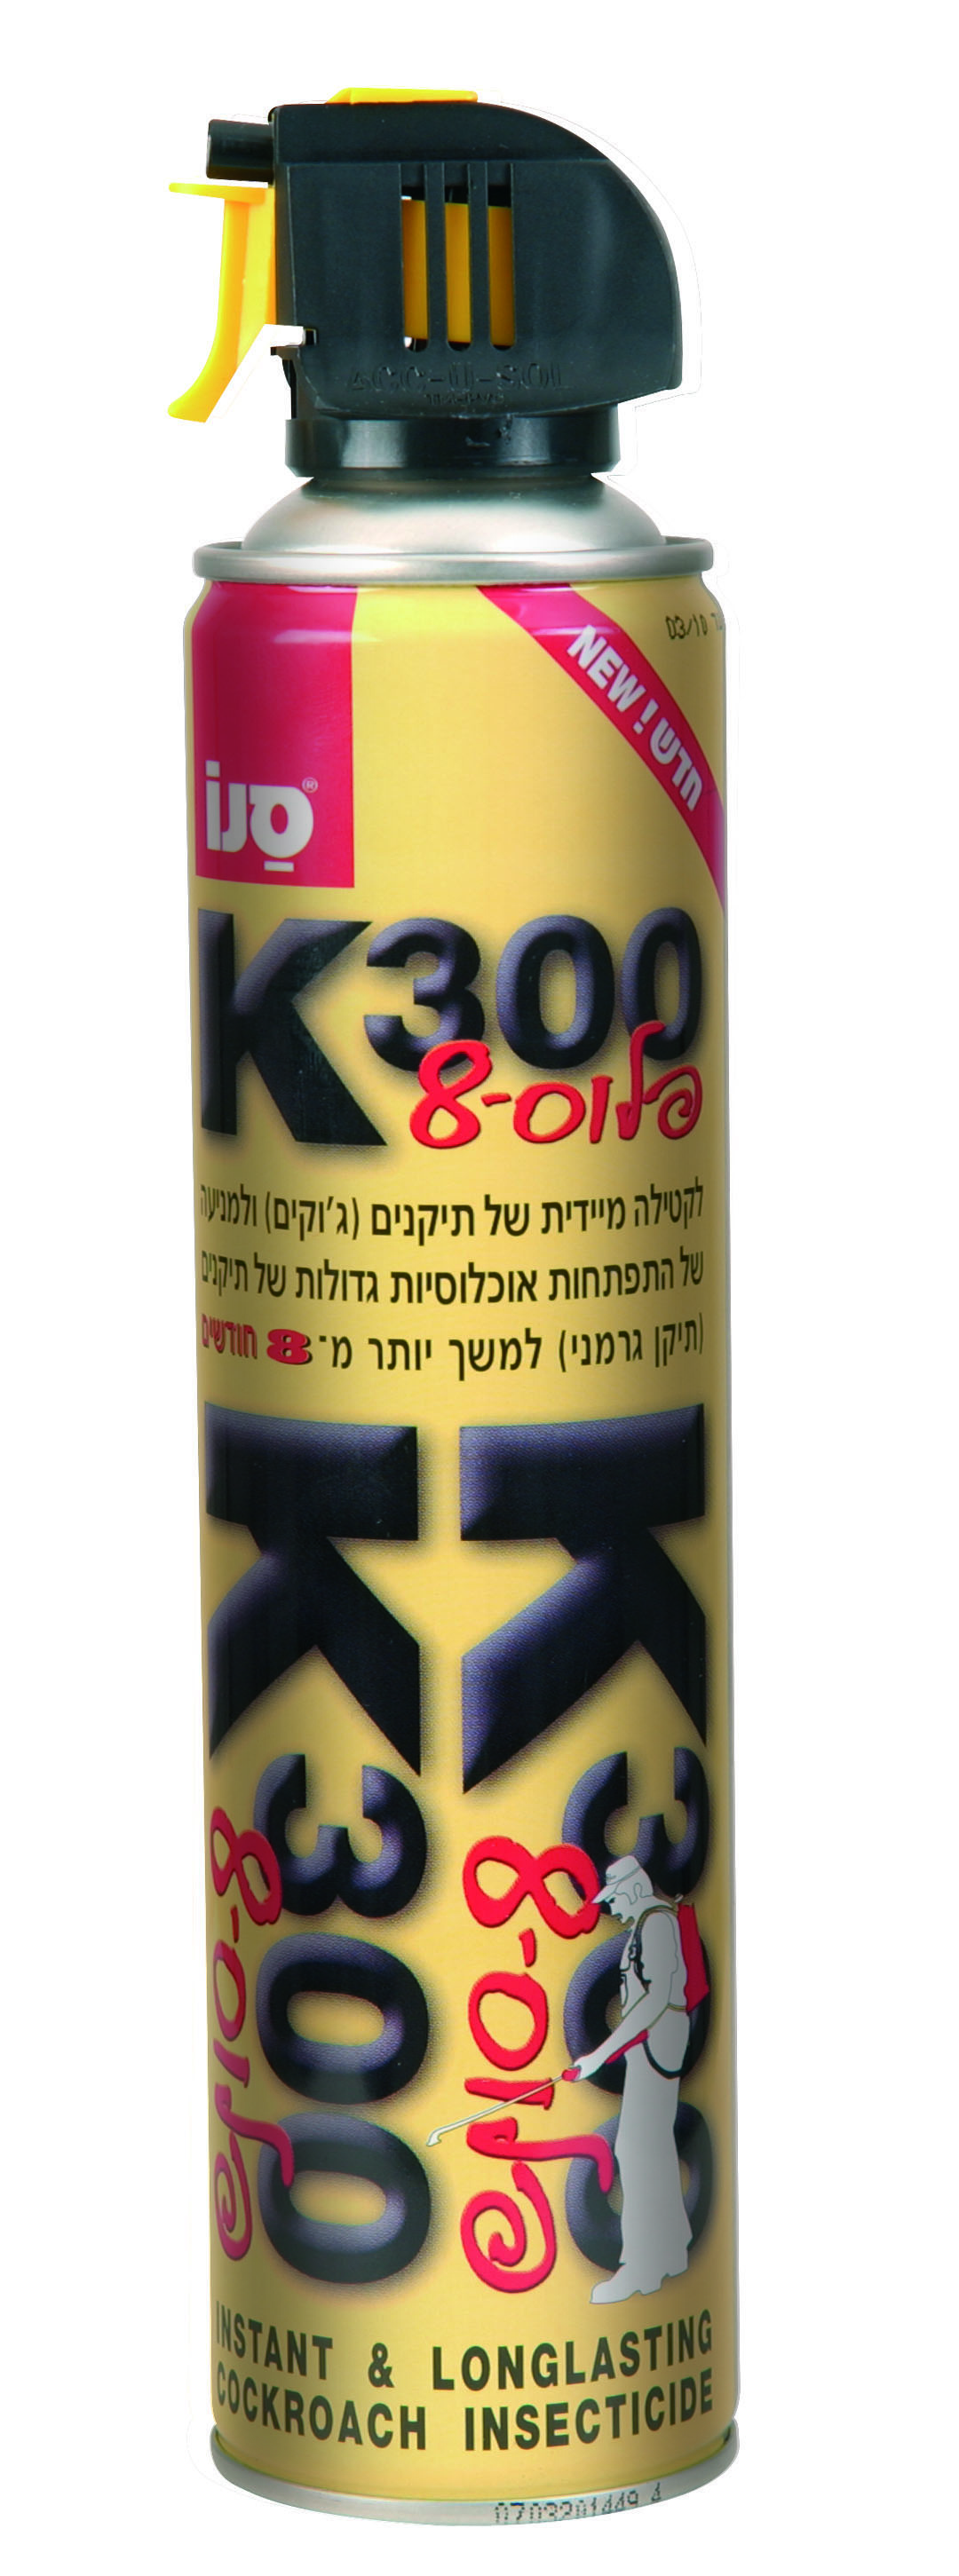 K-300 פלוס שמונה